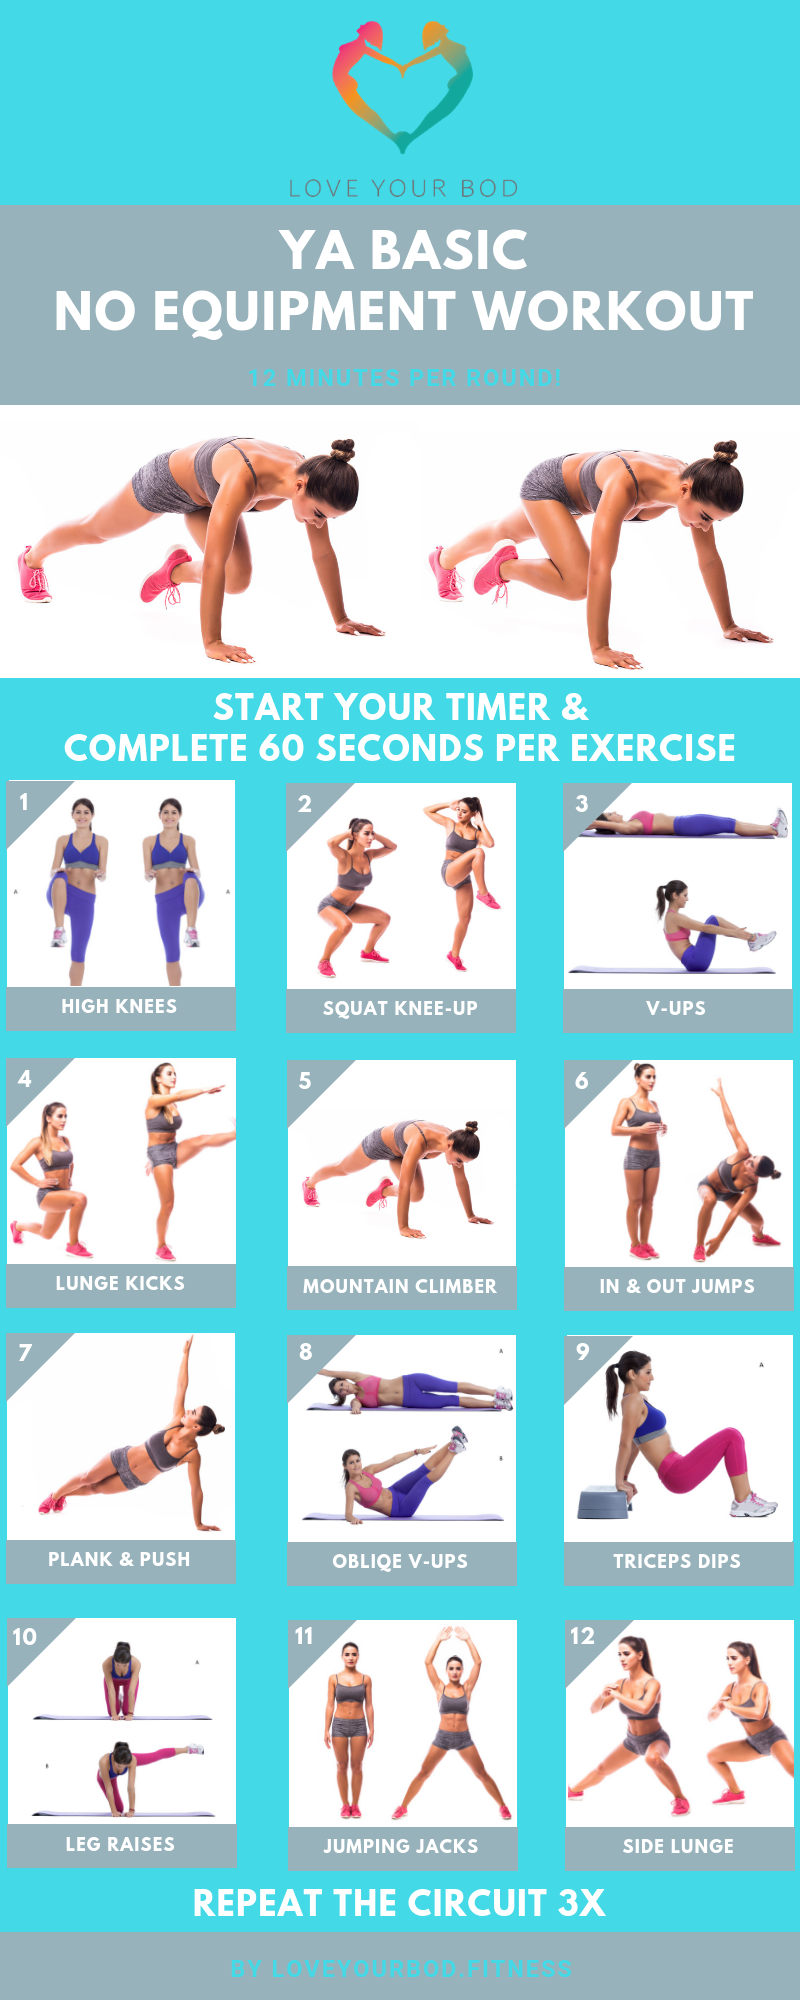 Full Body Home Workout - Ya Basic No Equipment   Body ...